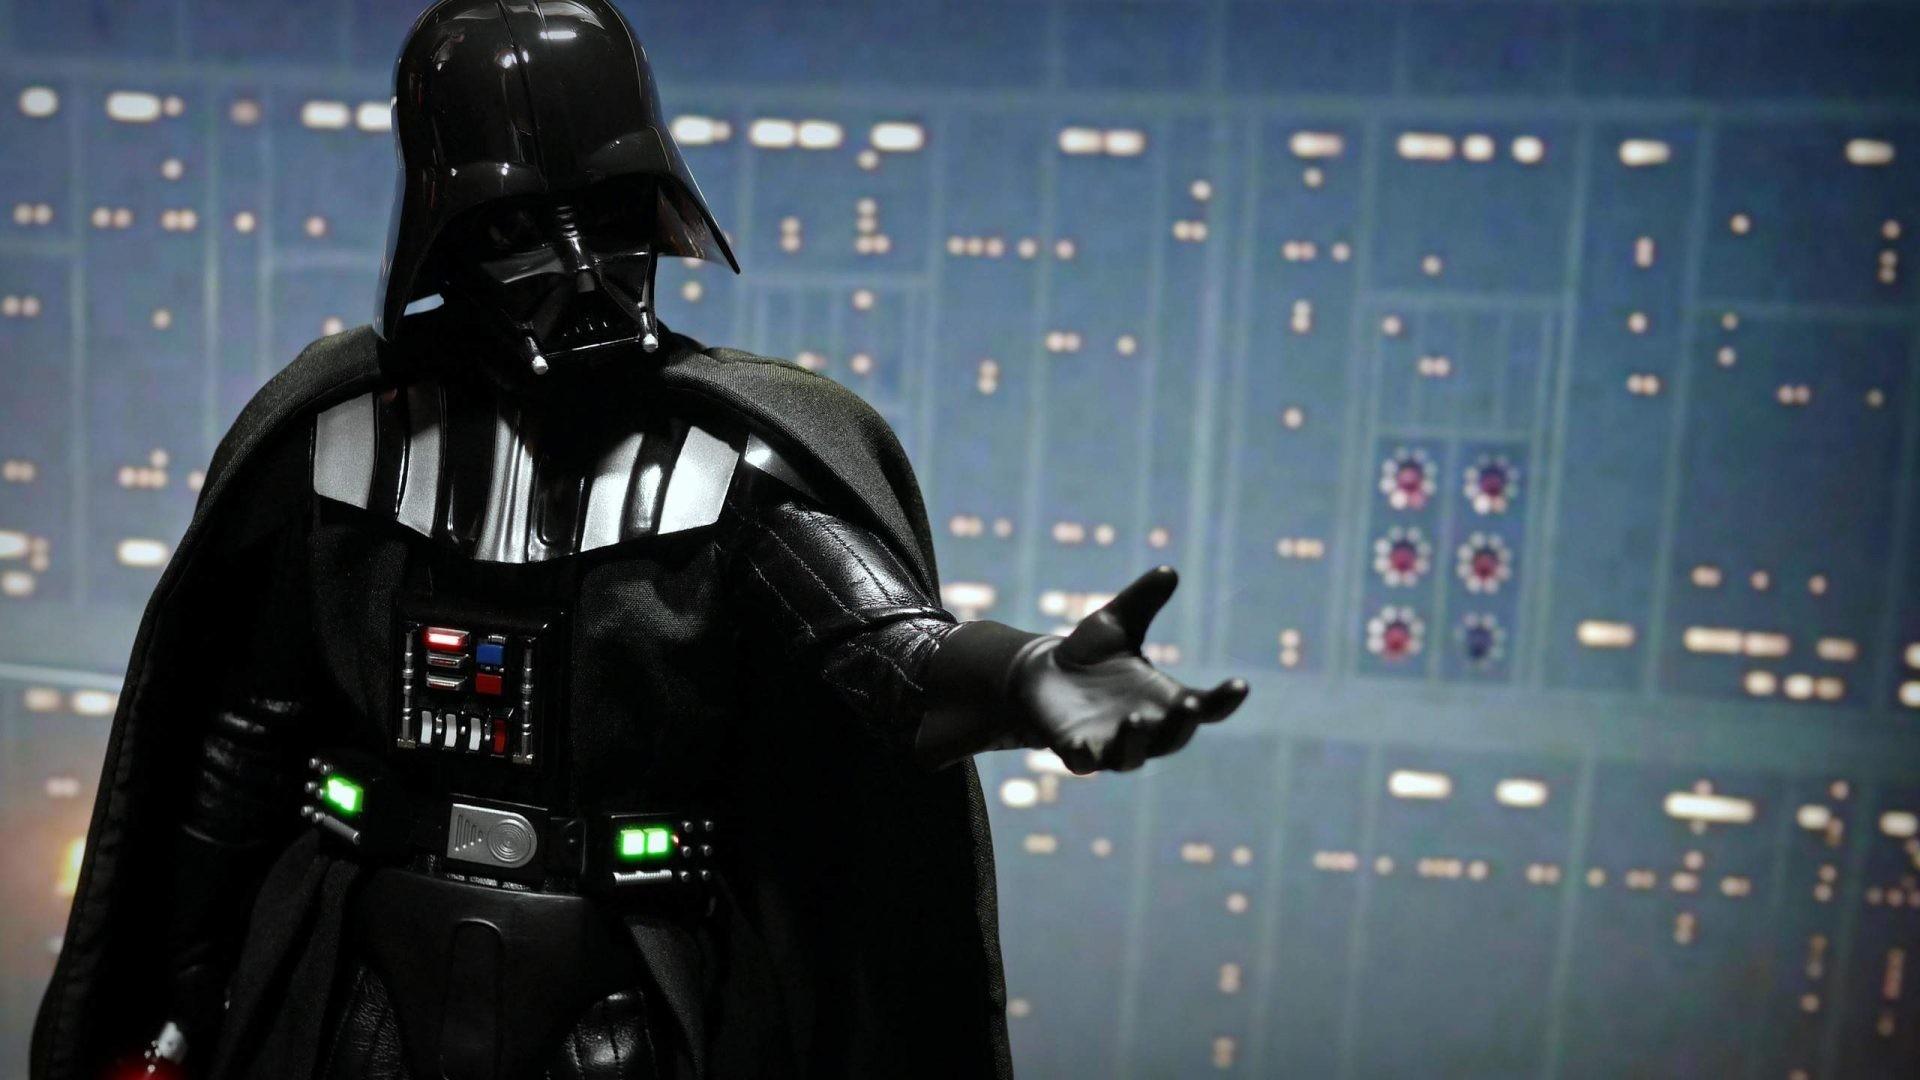 Darth Vader Wallpaper Iphone: Star Wars Anakin Skywalker Wallpaper (75+ Images